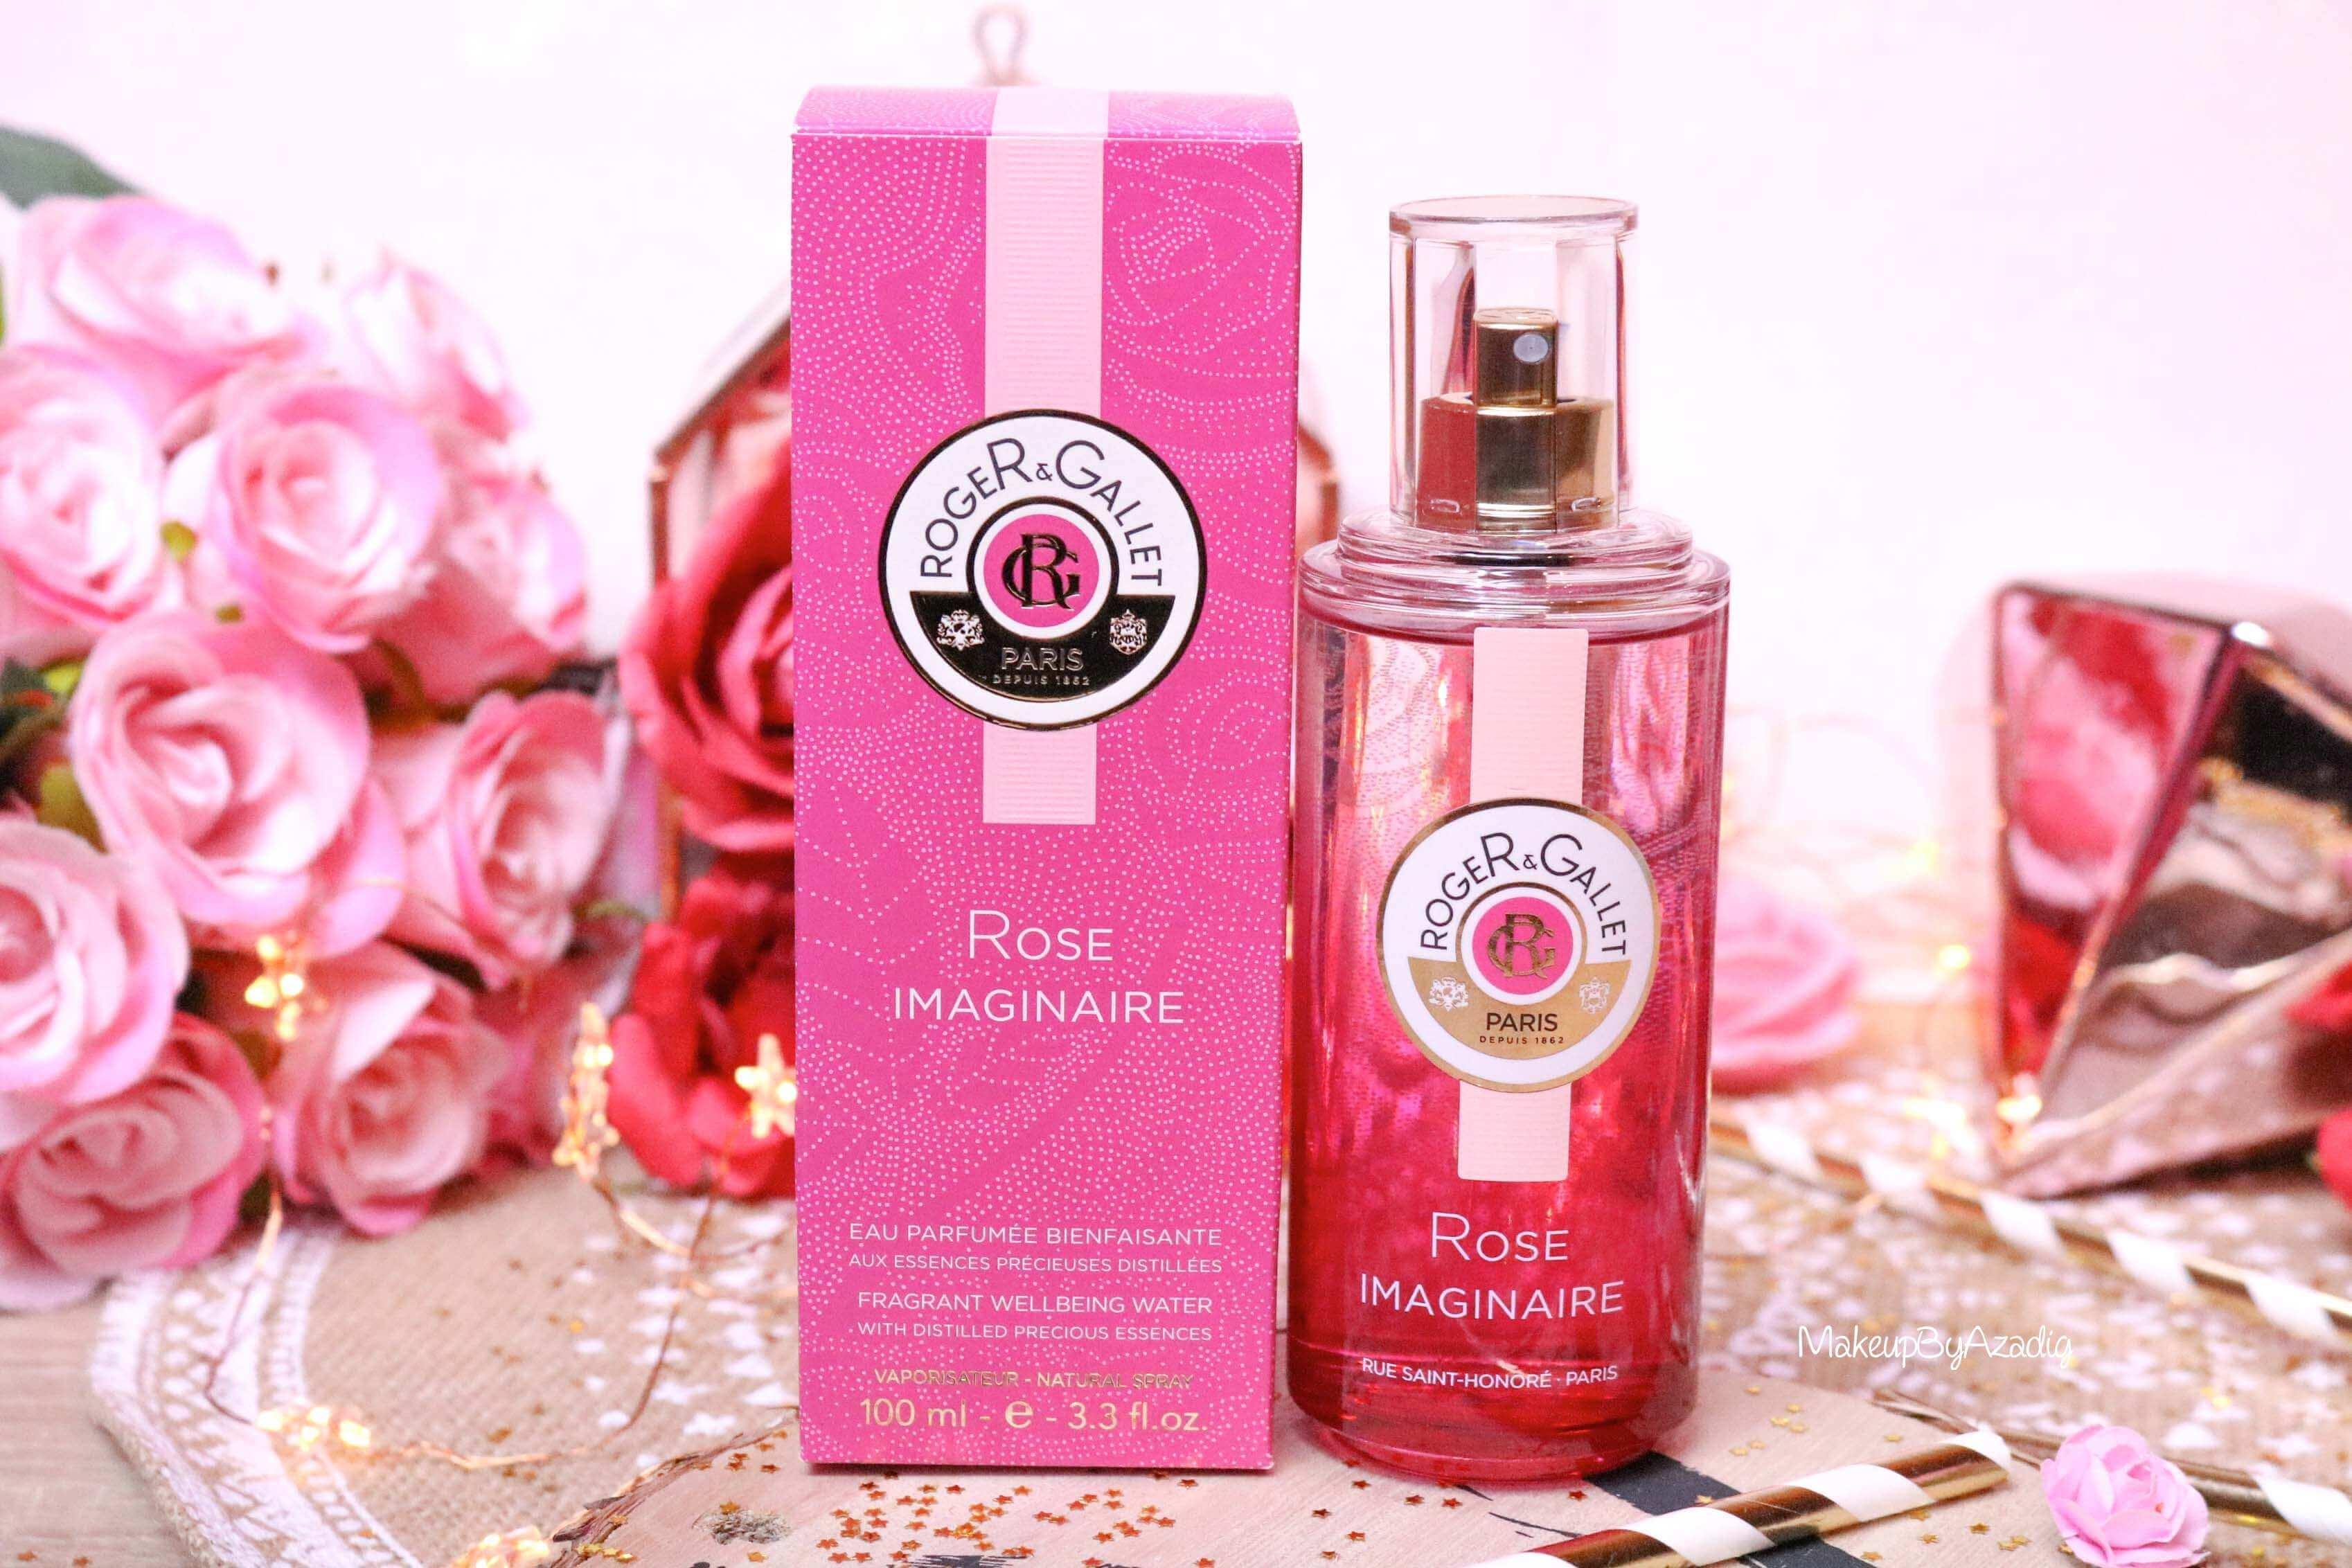 revue-eau-parfumee-bienfaisante-rose-imaginaire-roger-gallet-makeupbyazadig-parfum-bonne-tenue-avis-prix-monoprix-packaging